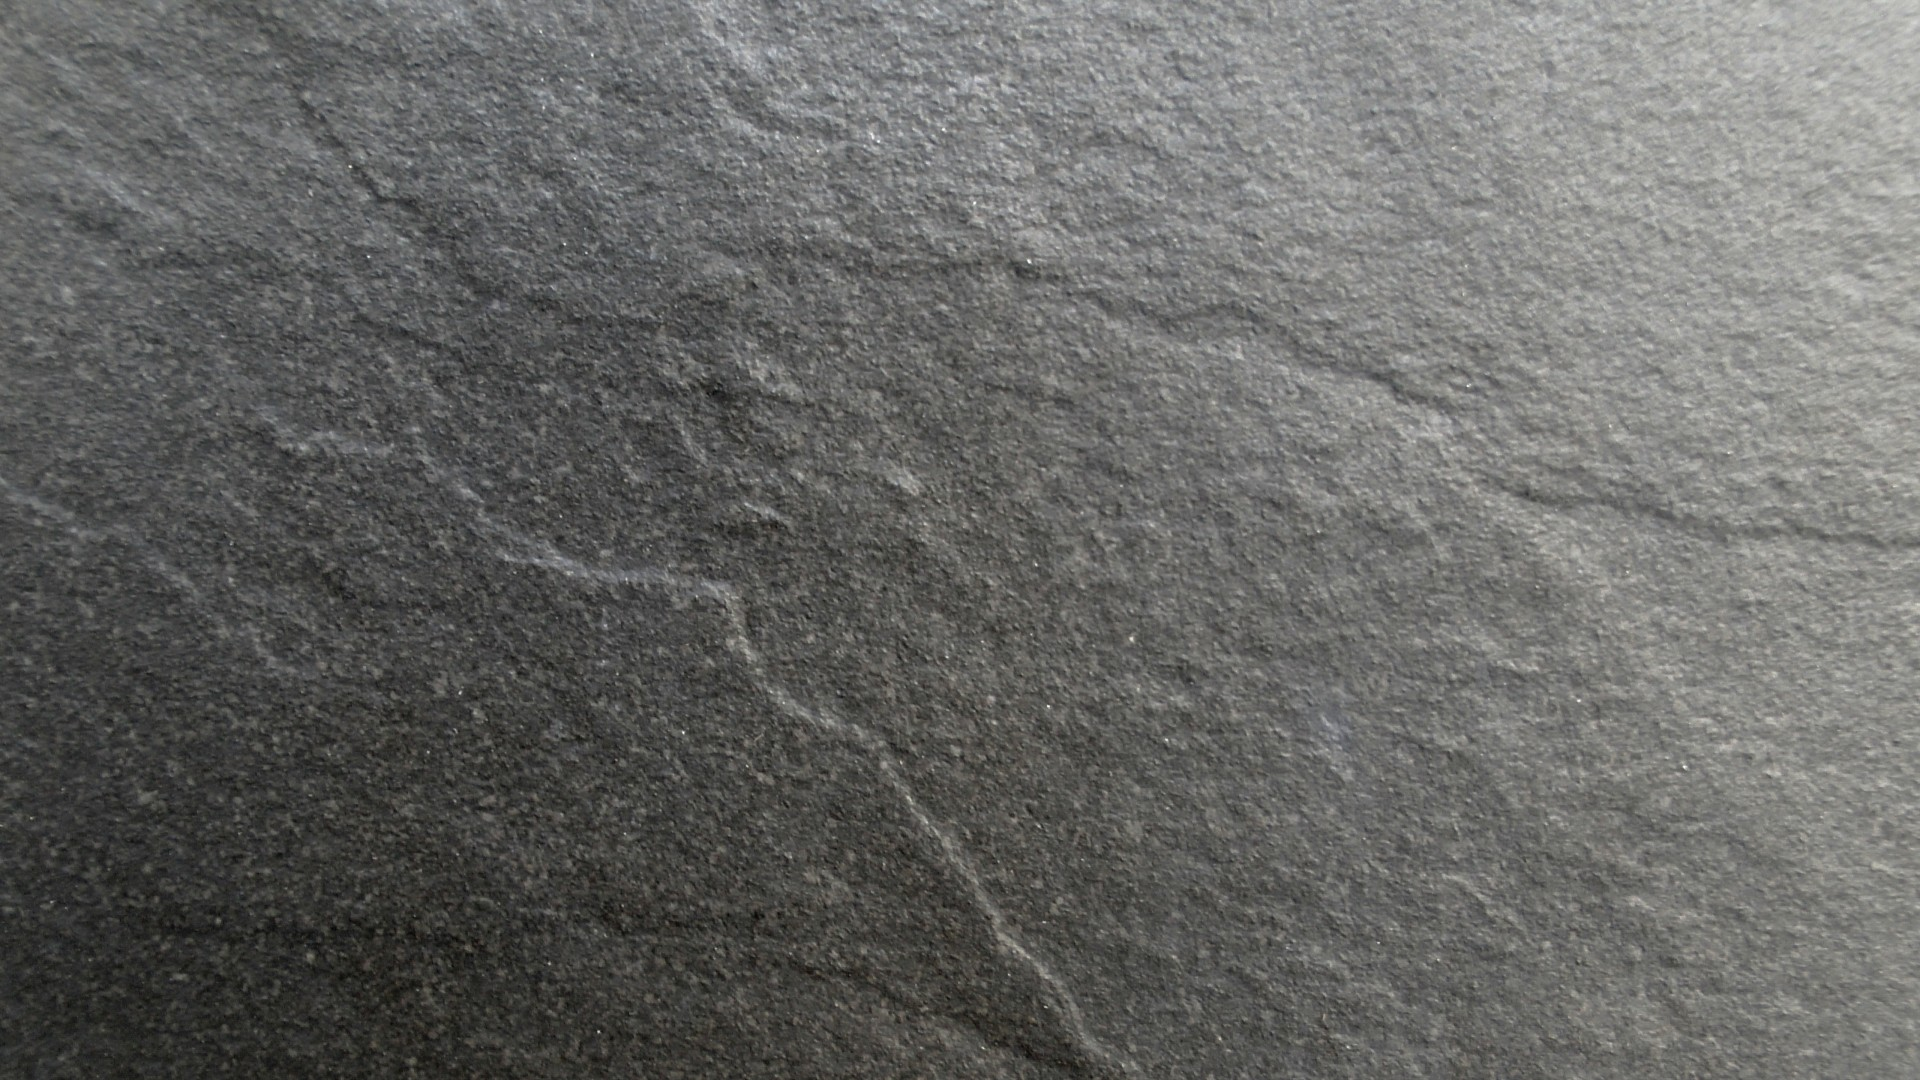 Marble Wallpaper Iphone 7 Plus Ardoise Fond D 233 Cran Hd